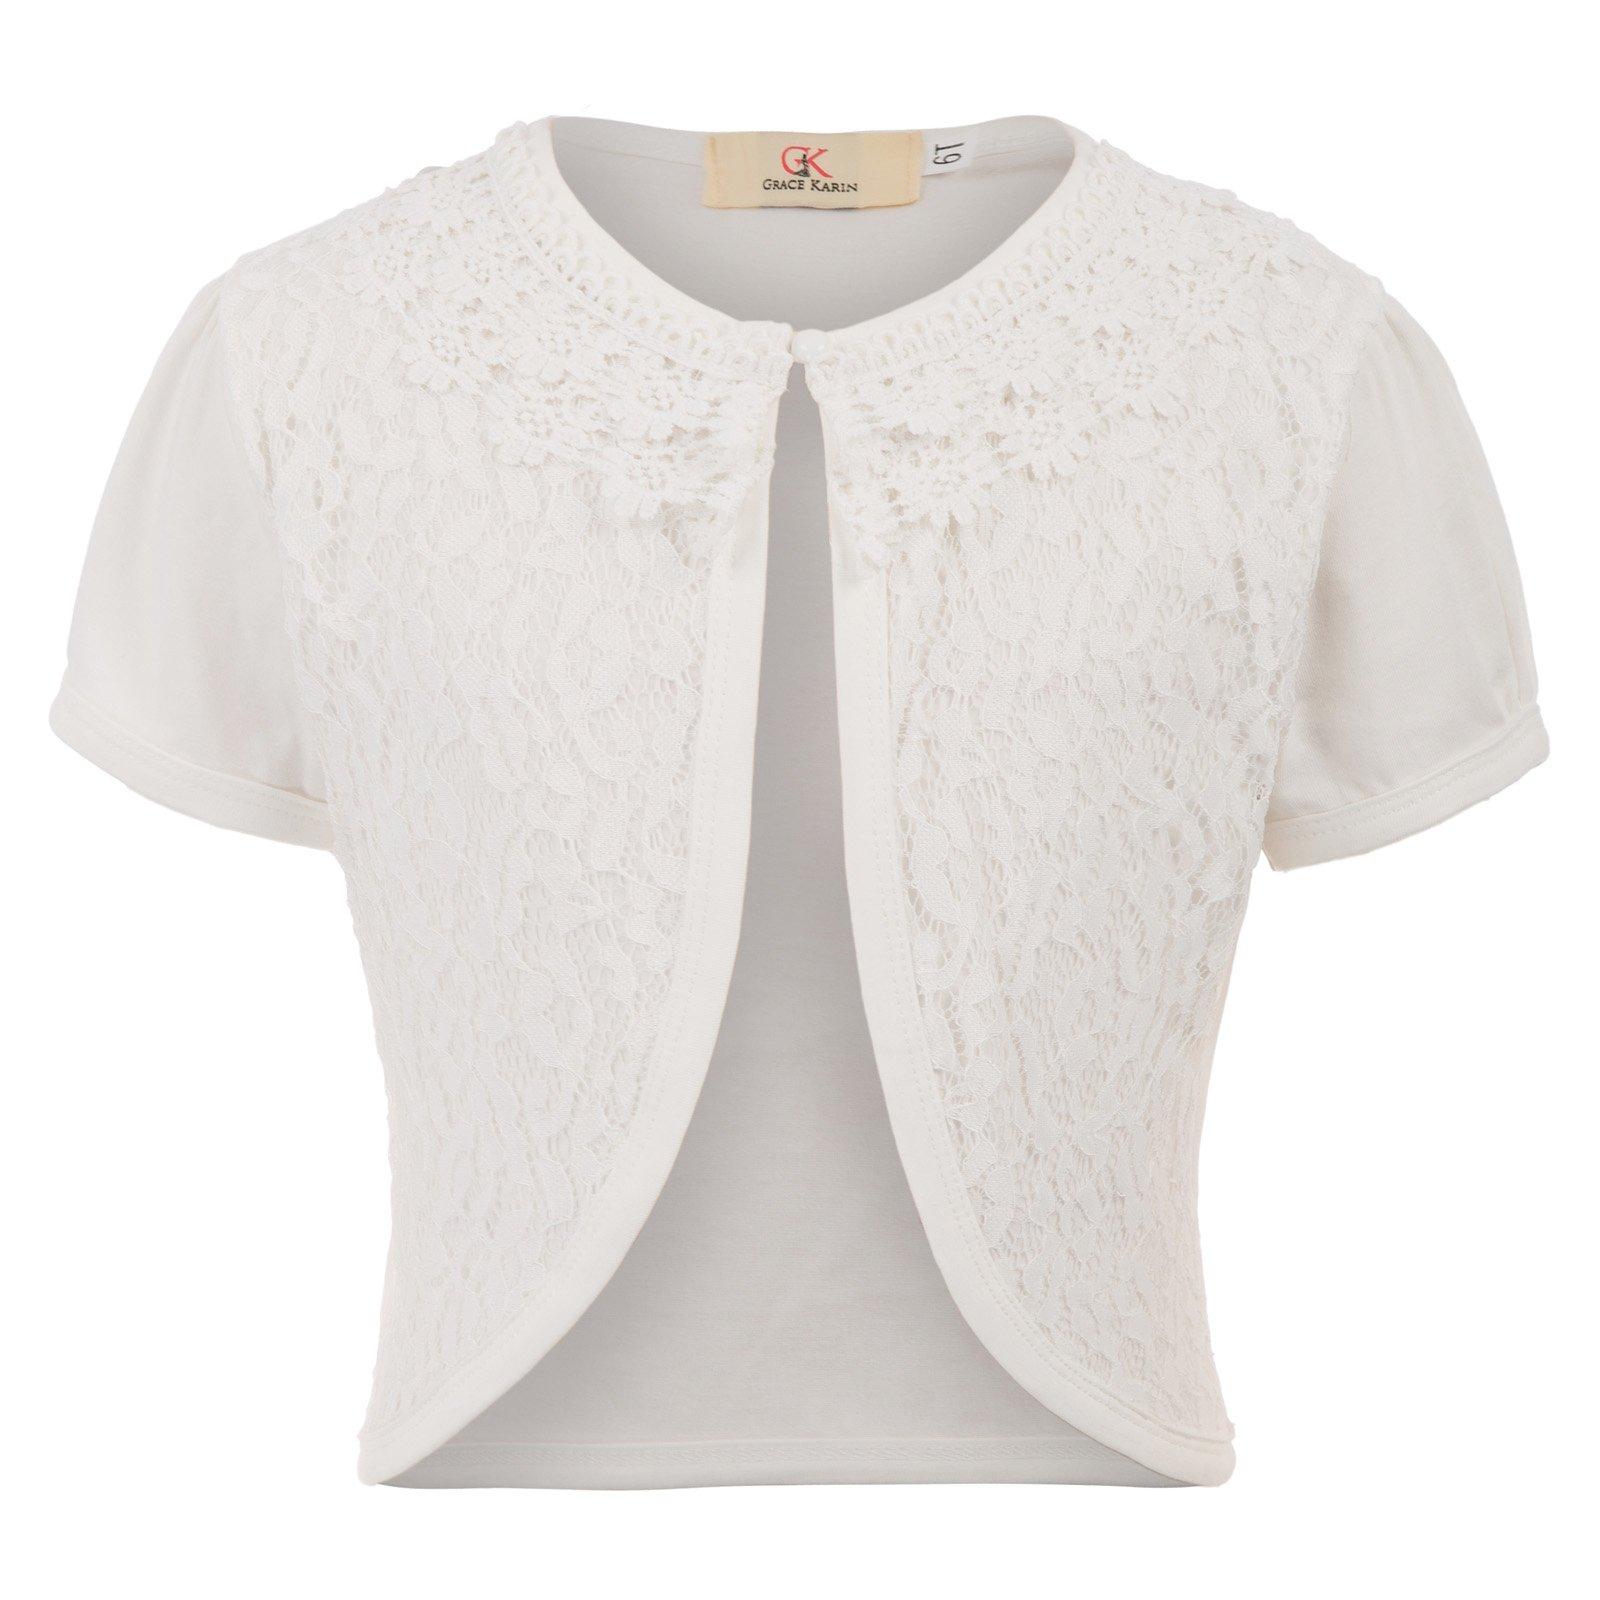 GRACE KARIN Cardigan Short Sleeve Button Cotton Sweater for Little Girls 10T CL774-2